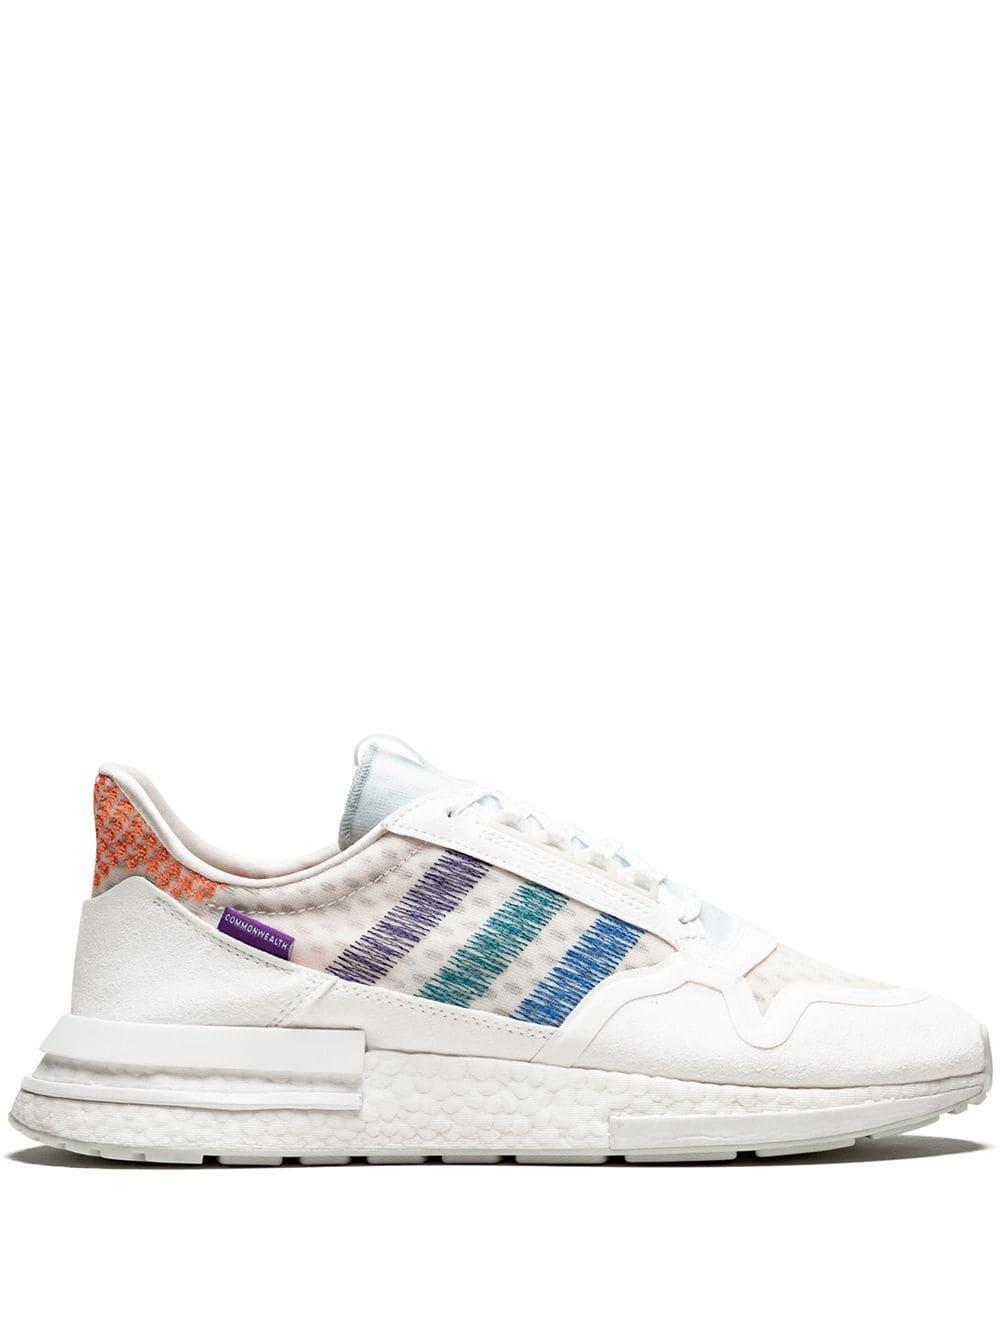 commonwealth adidas zx 500